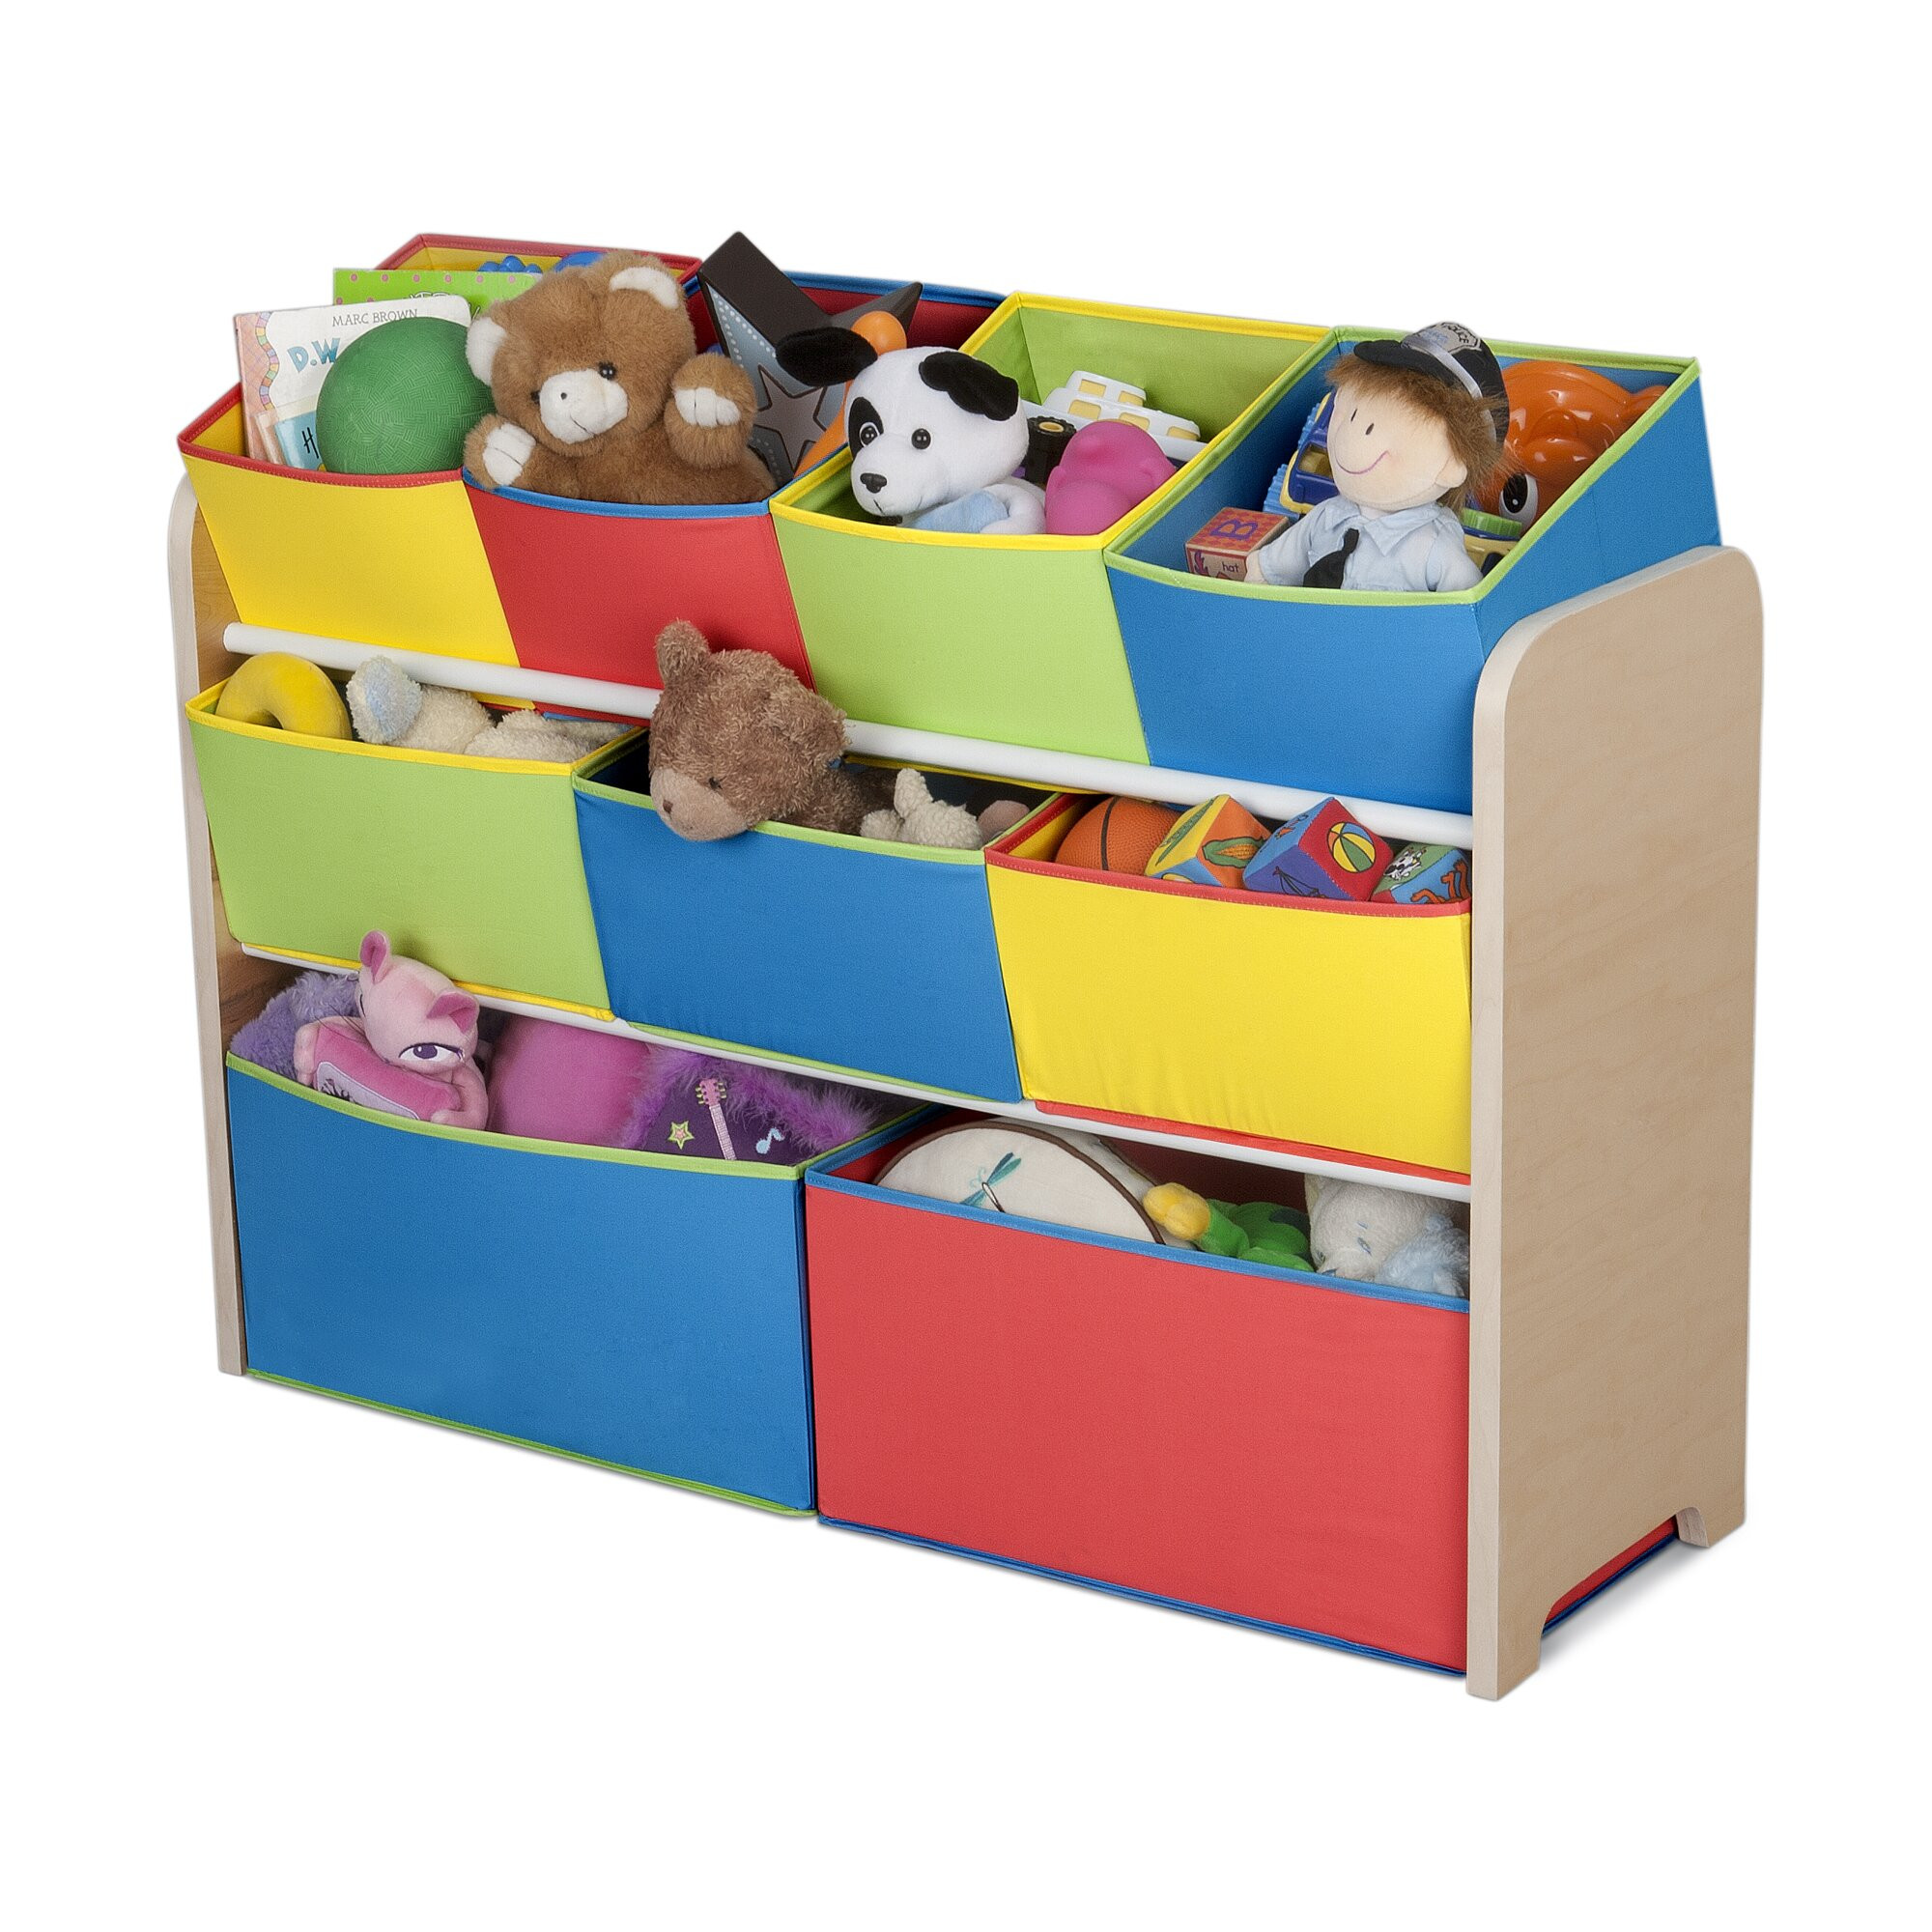 Kids Toys Storage  Delta Children Multi Color Deluxe Toy Organizer with Bins